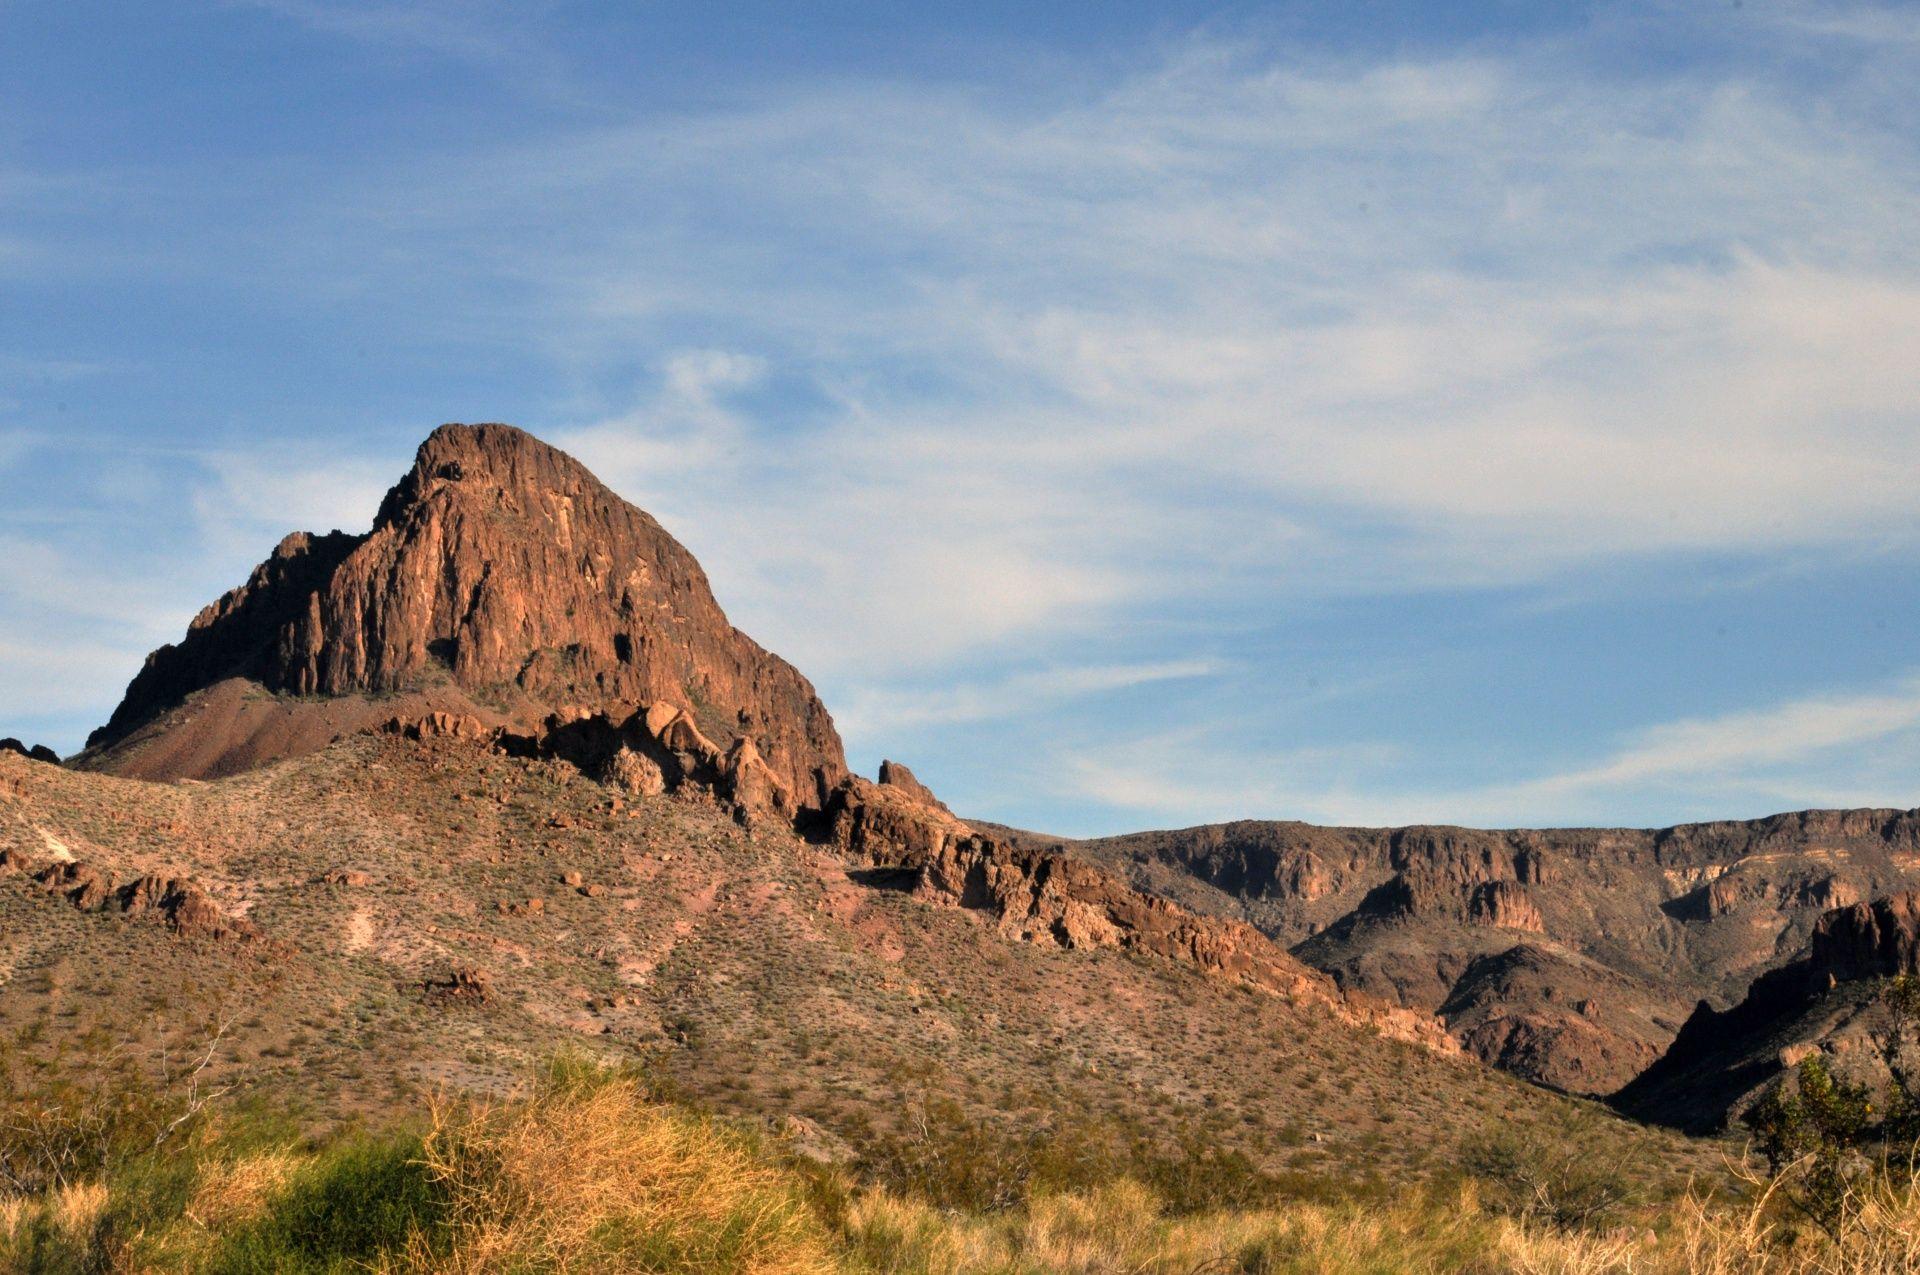 Resultado de imagen de rocky desert